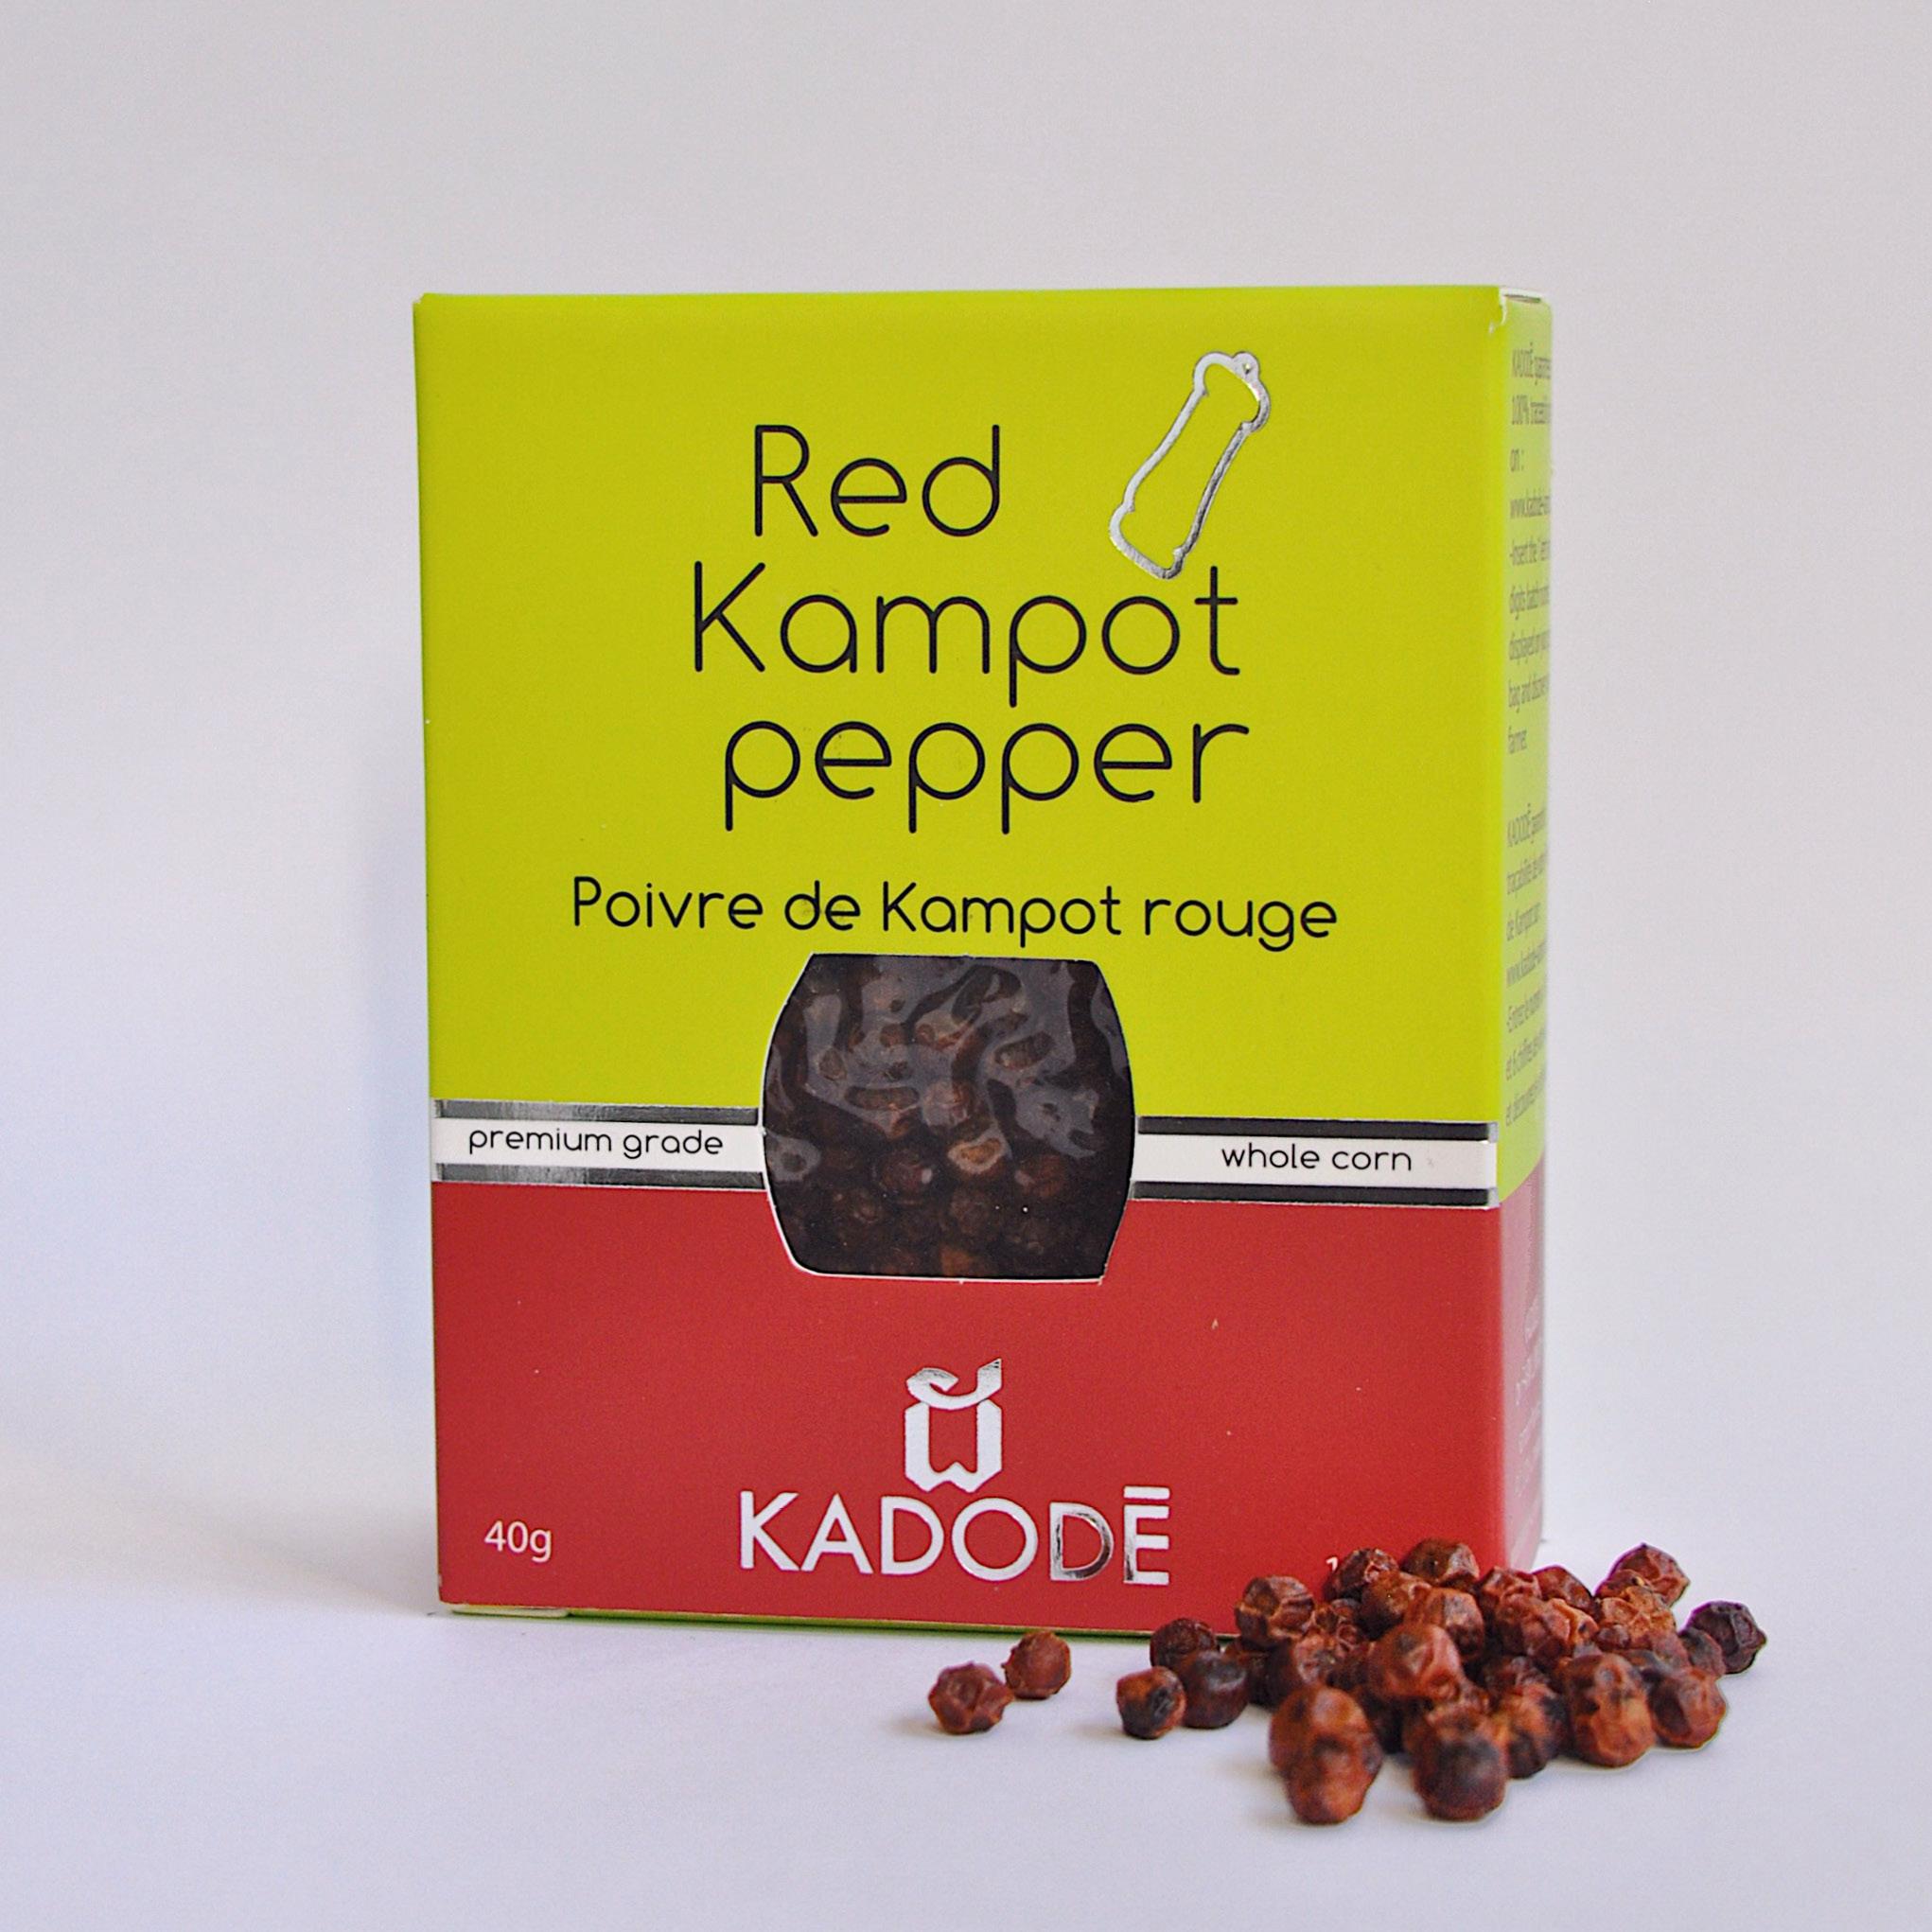 Kampot Product Shots2.jpg